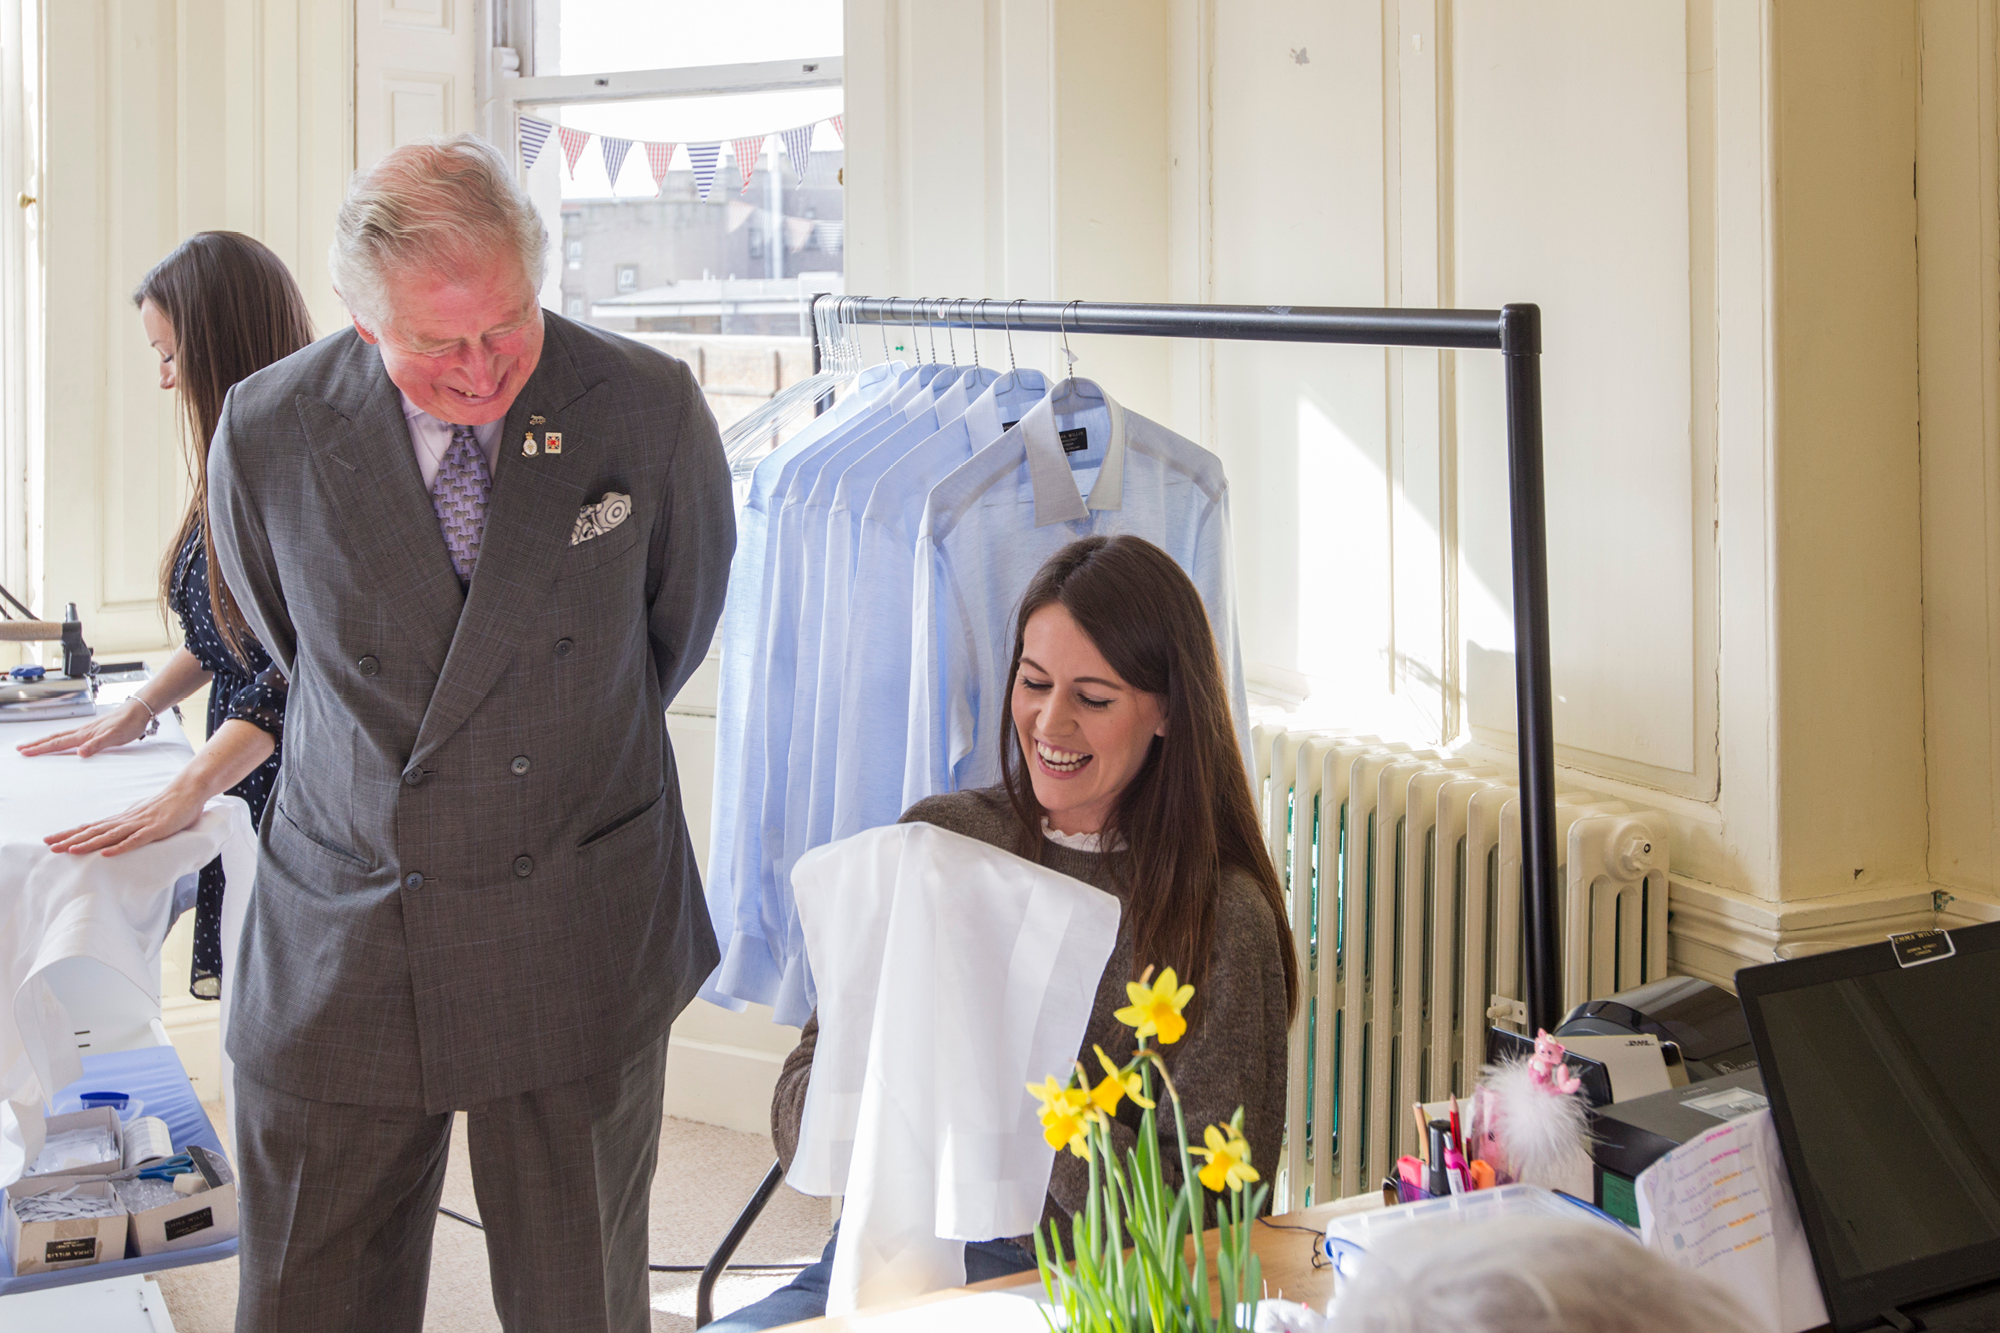 HRH Prince Charles visiting Emma Willis's factory